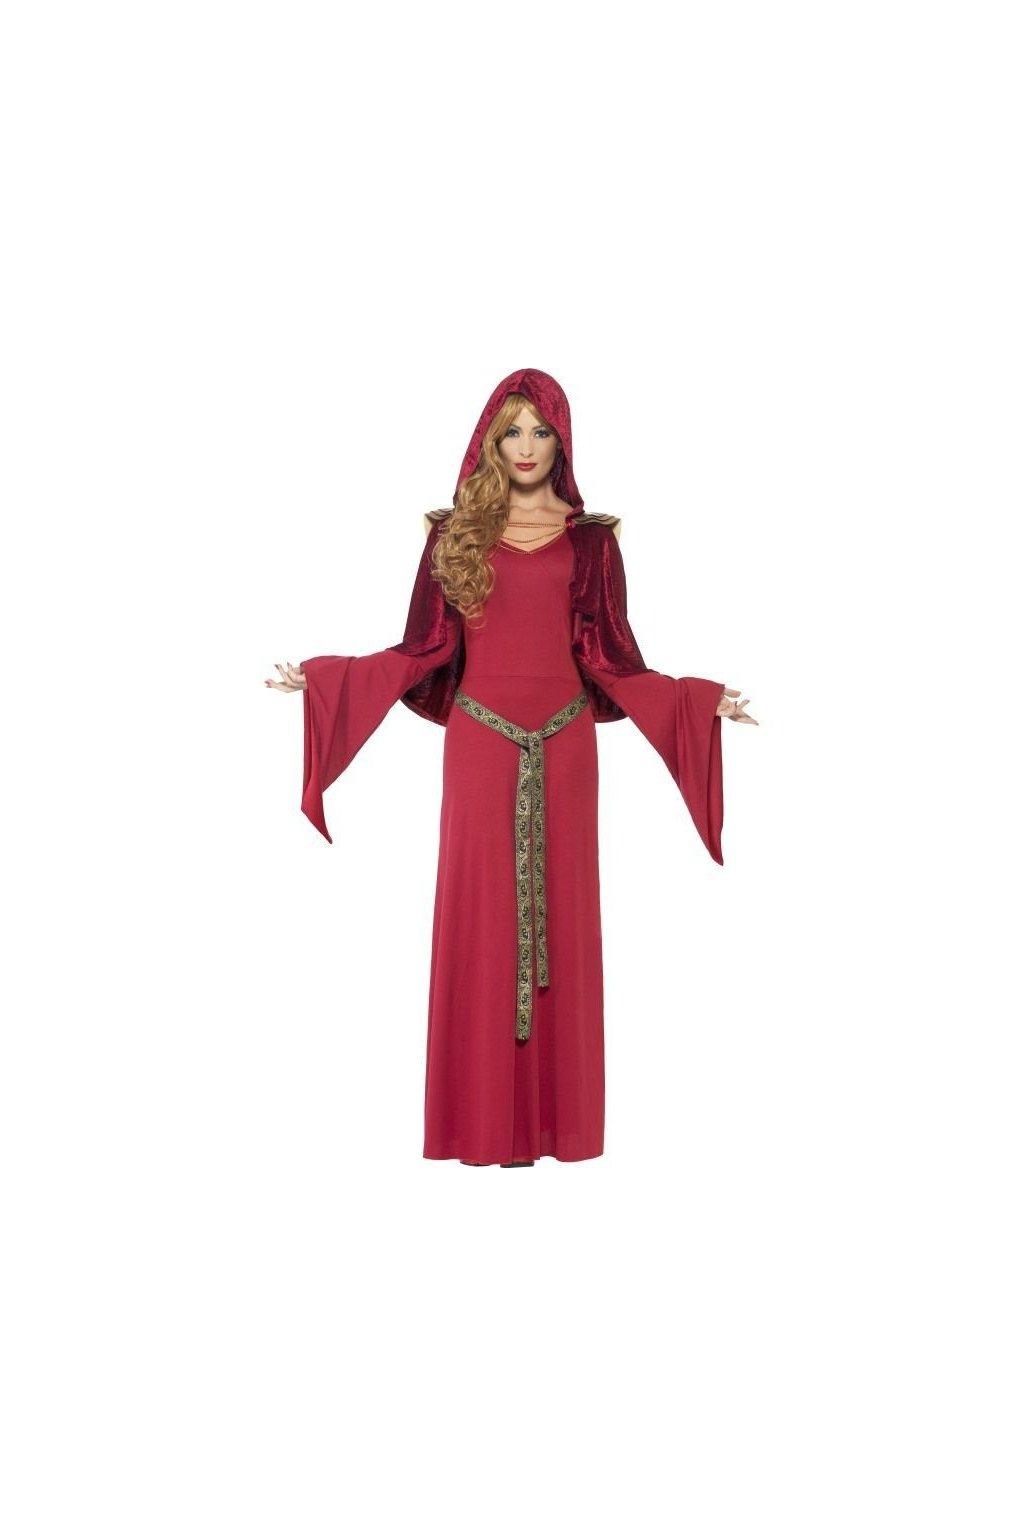 Kostým - Rudá kněžka Melisandra